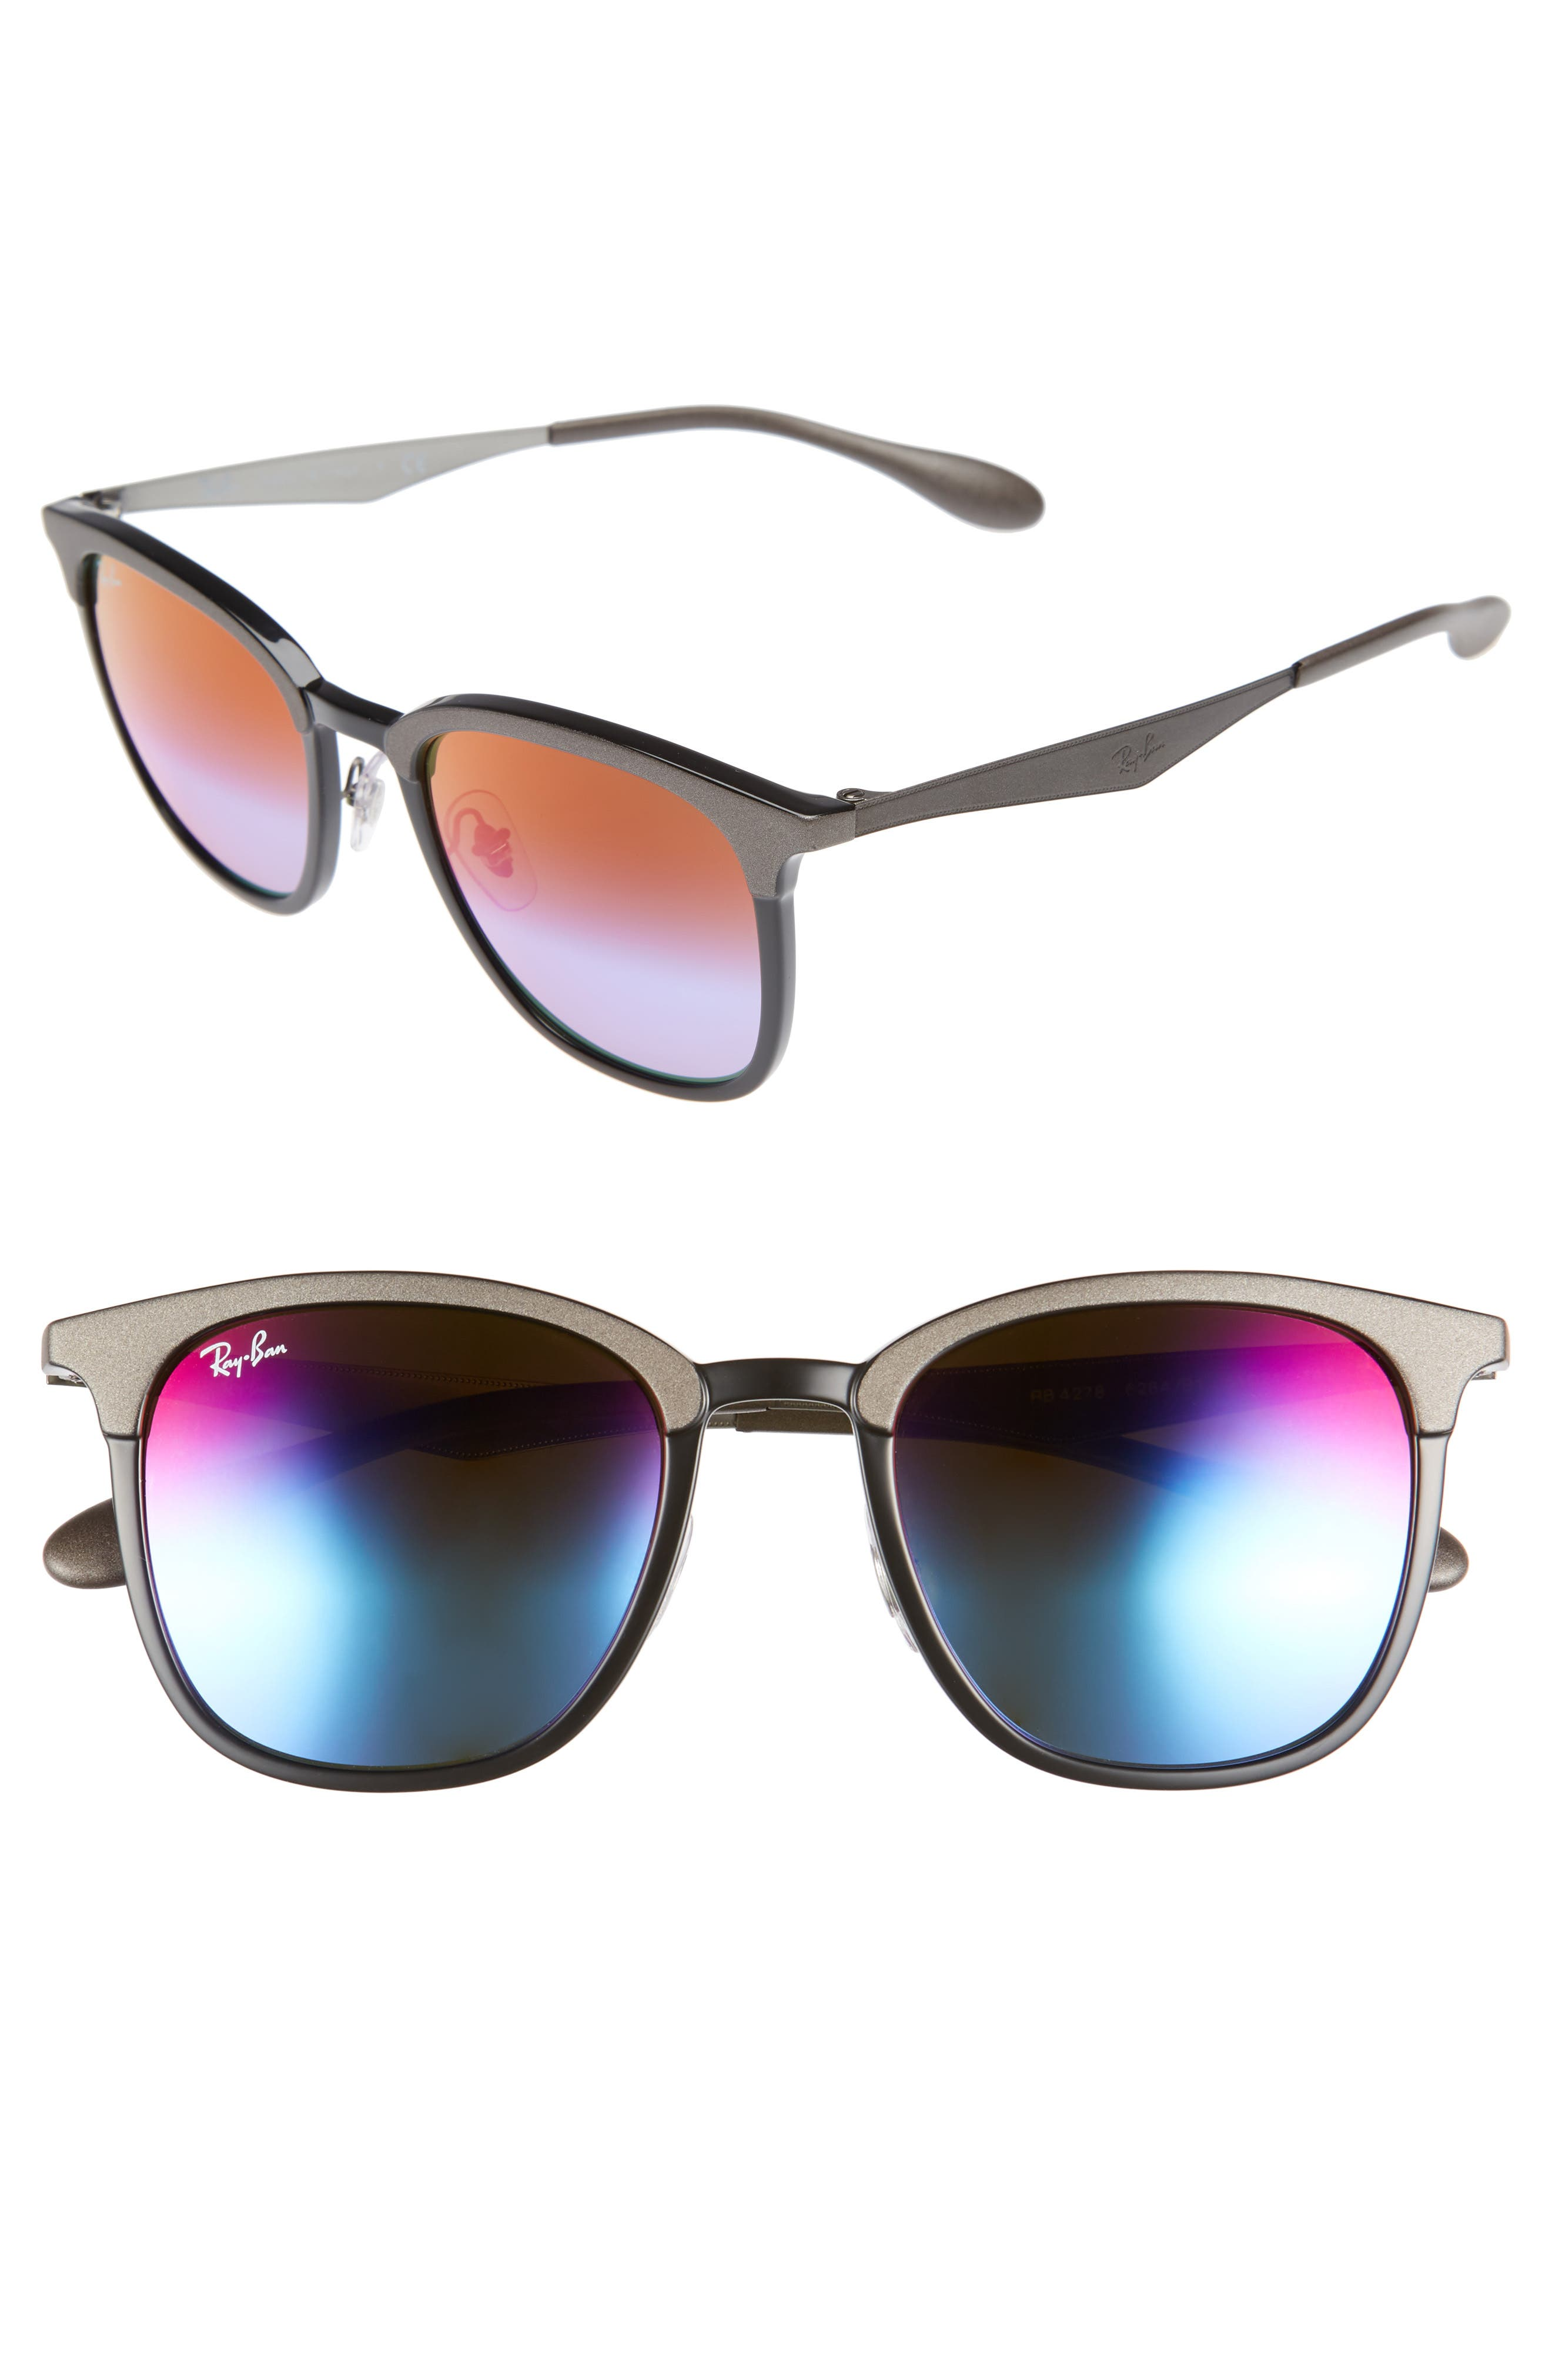 Highstreet 51mm Sunglasses,                         Main,                         color,